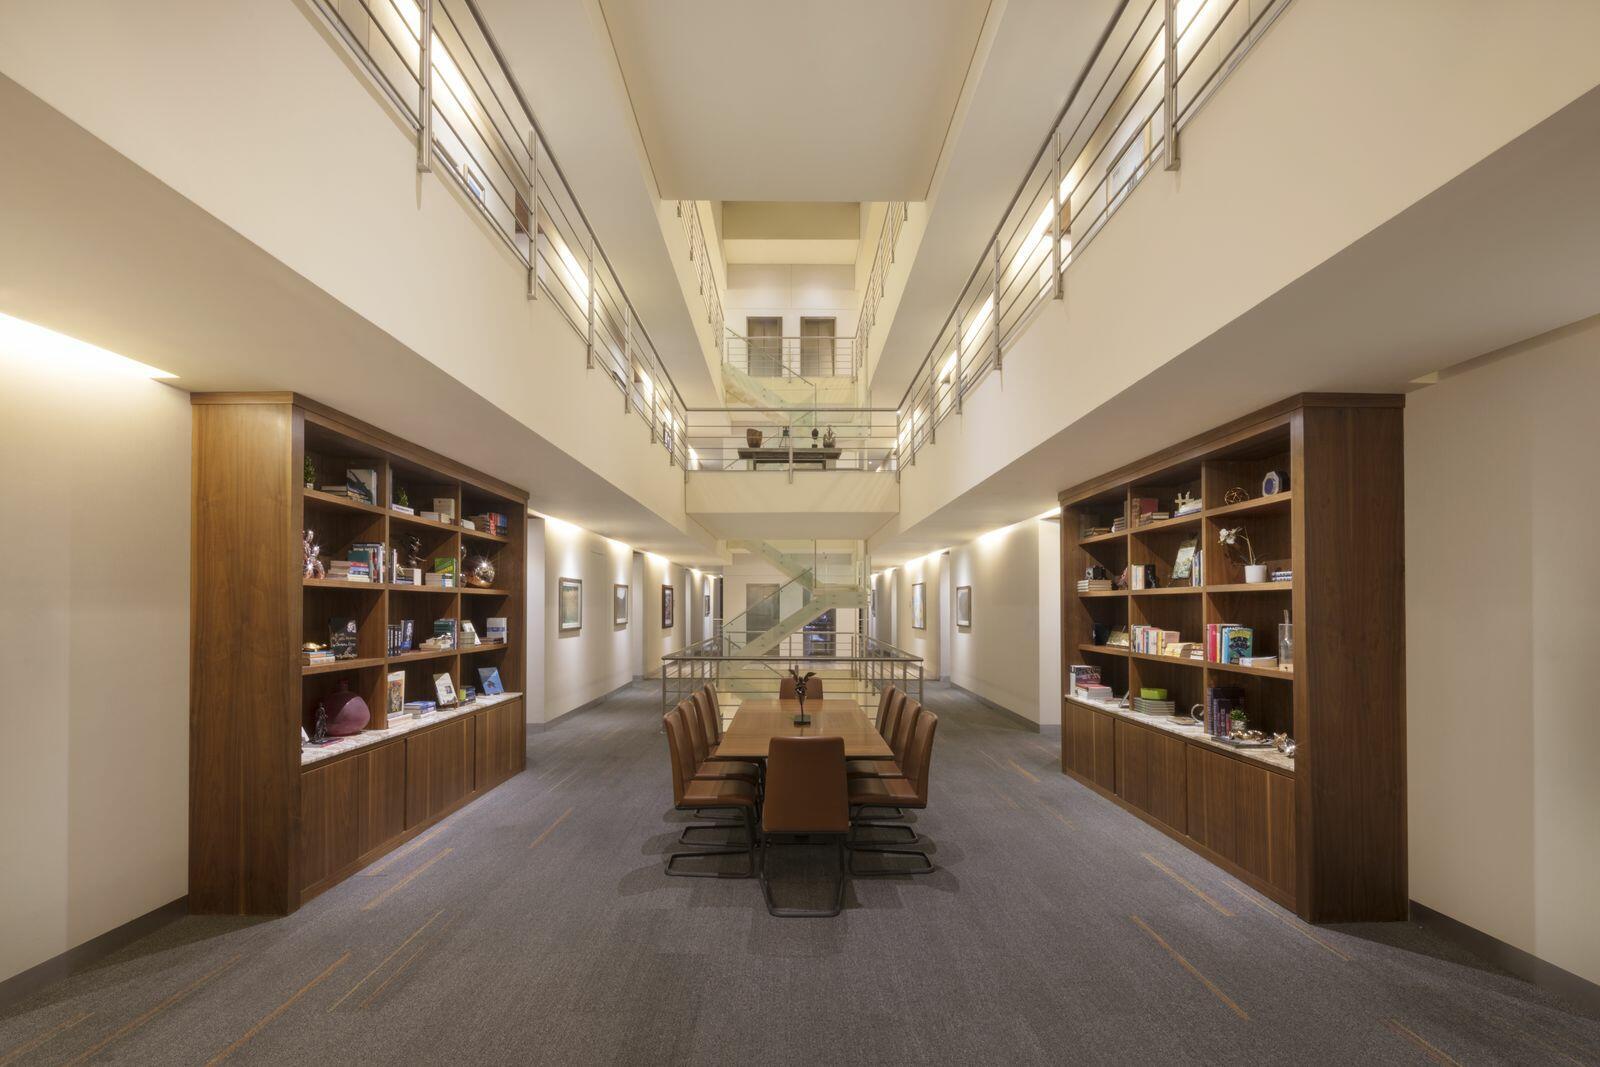 Executive Floor Library Color Corrected Corrected